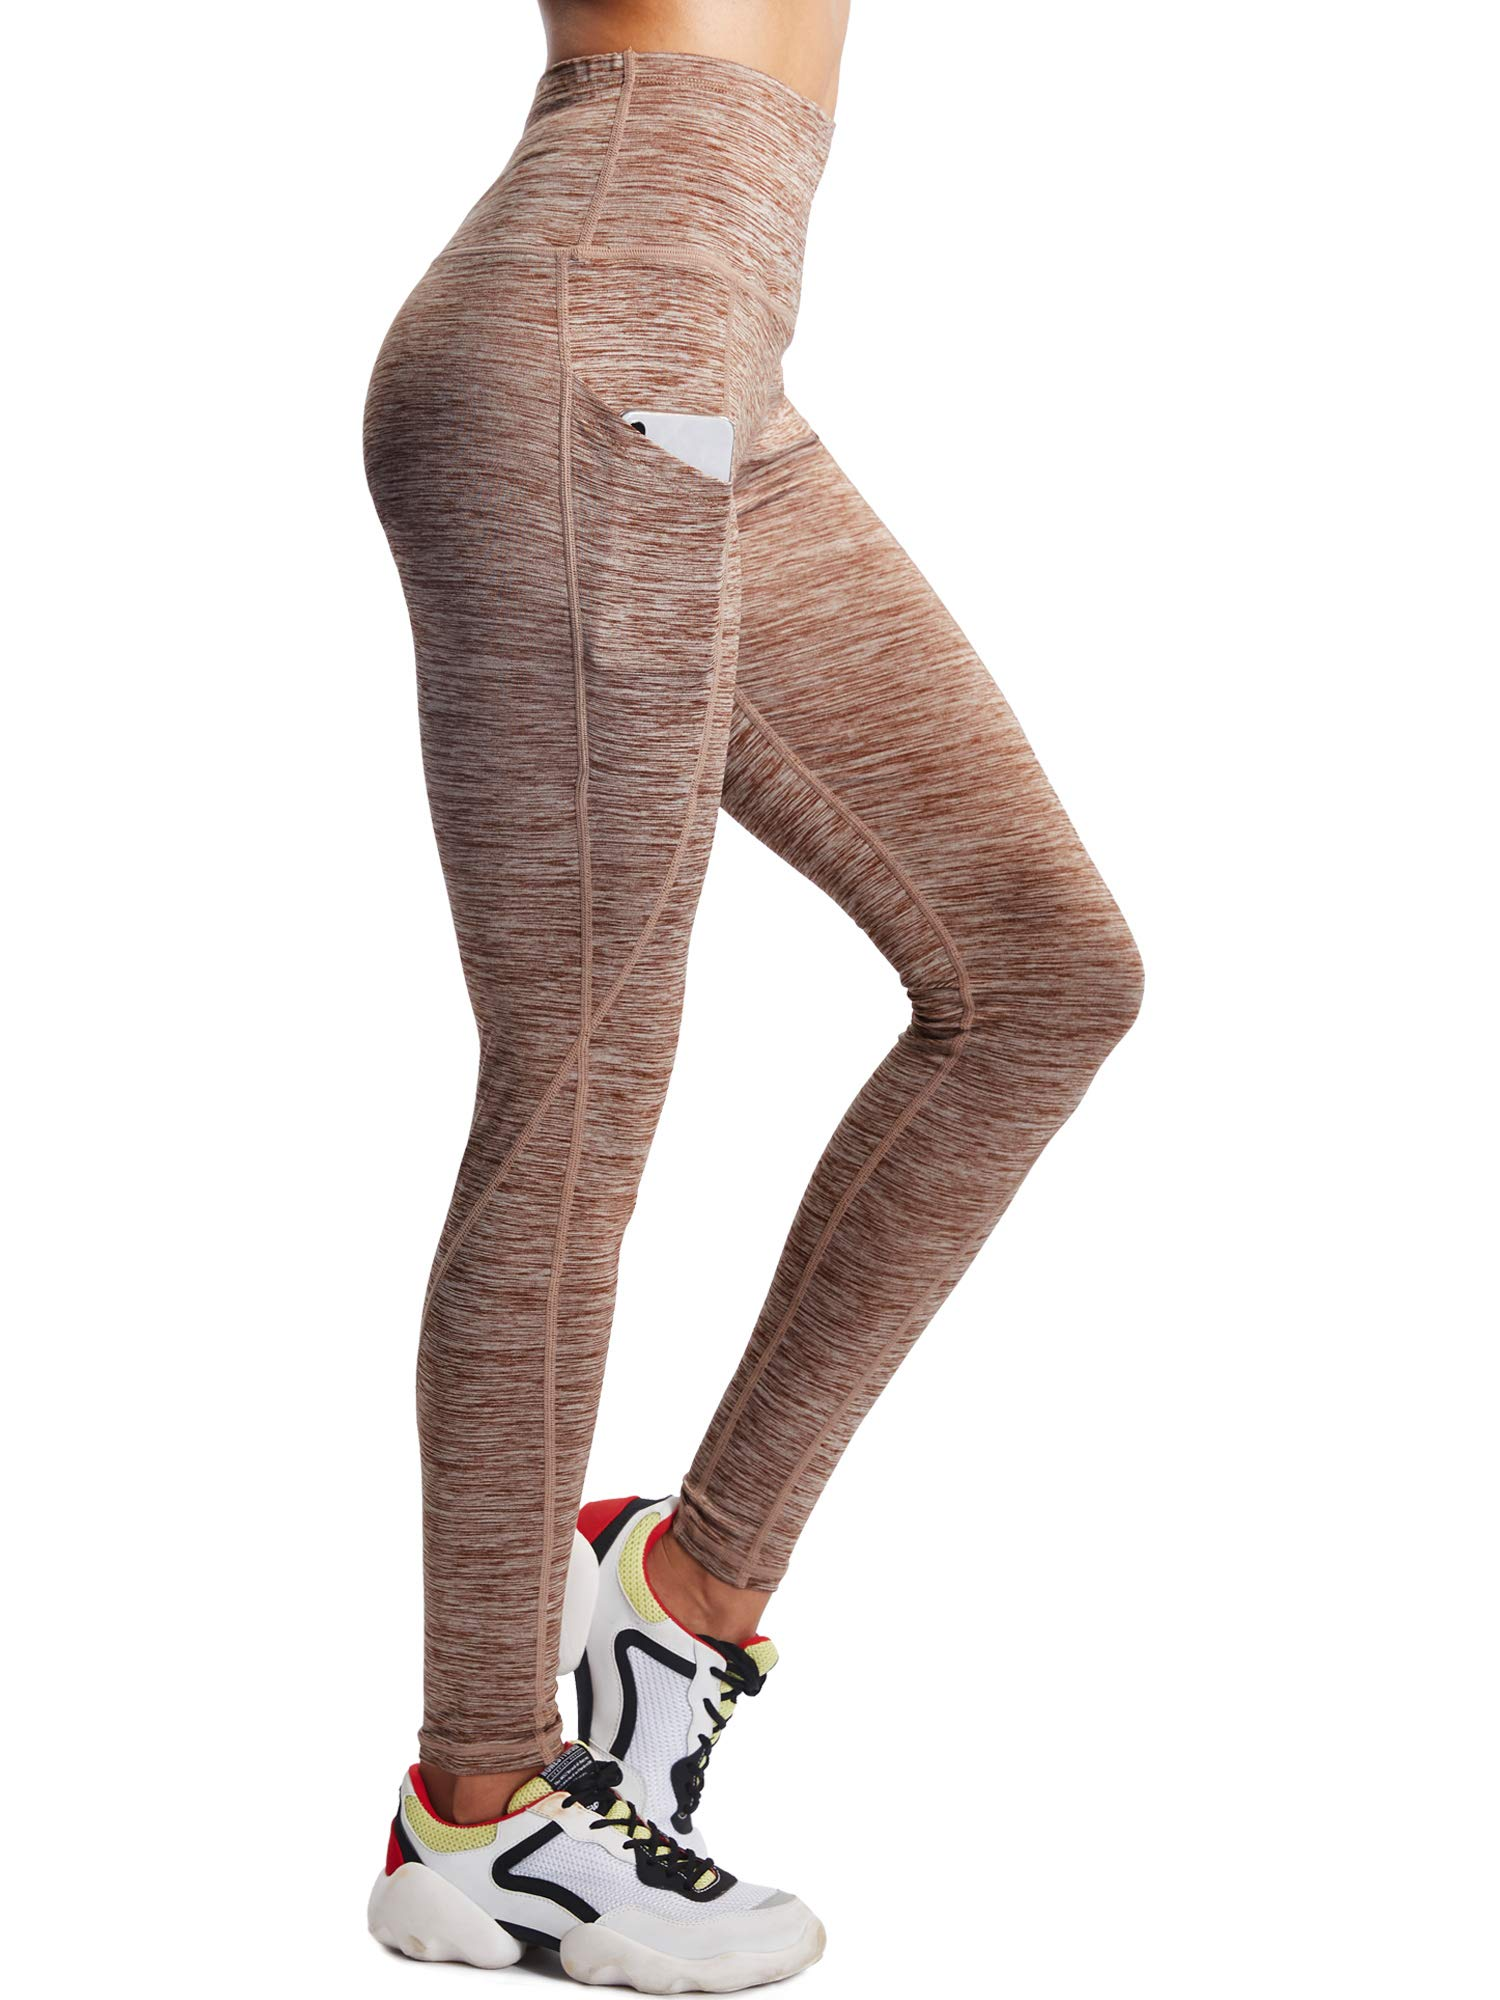 Neleus Tummy Control High Waist Workout Running Leggings for Women,9033,One Piece,Brown,S,EU M by Neleus